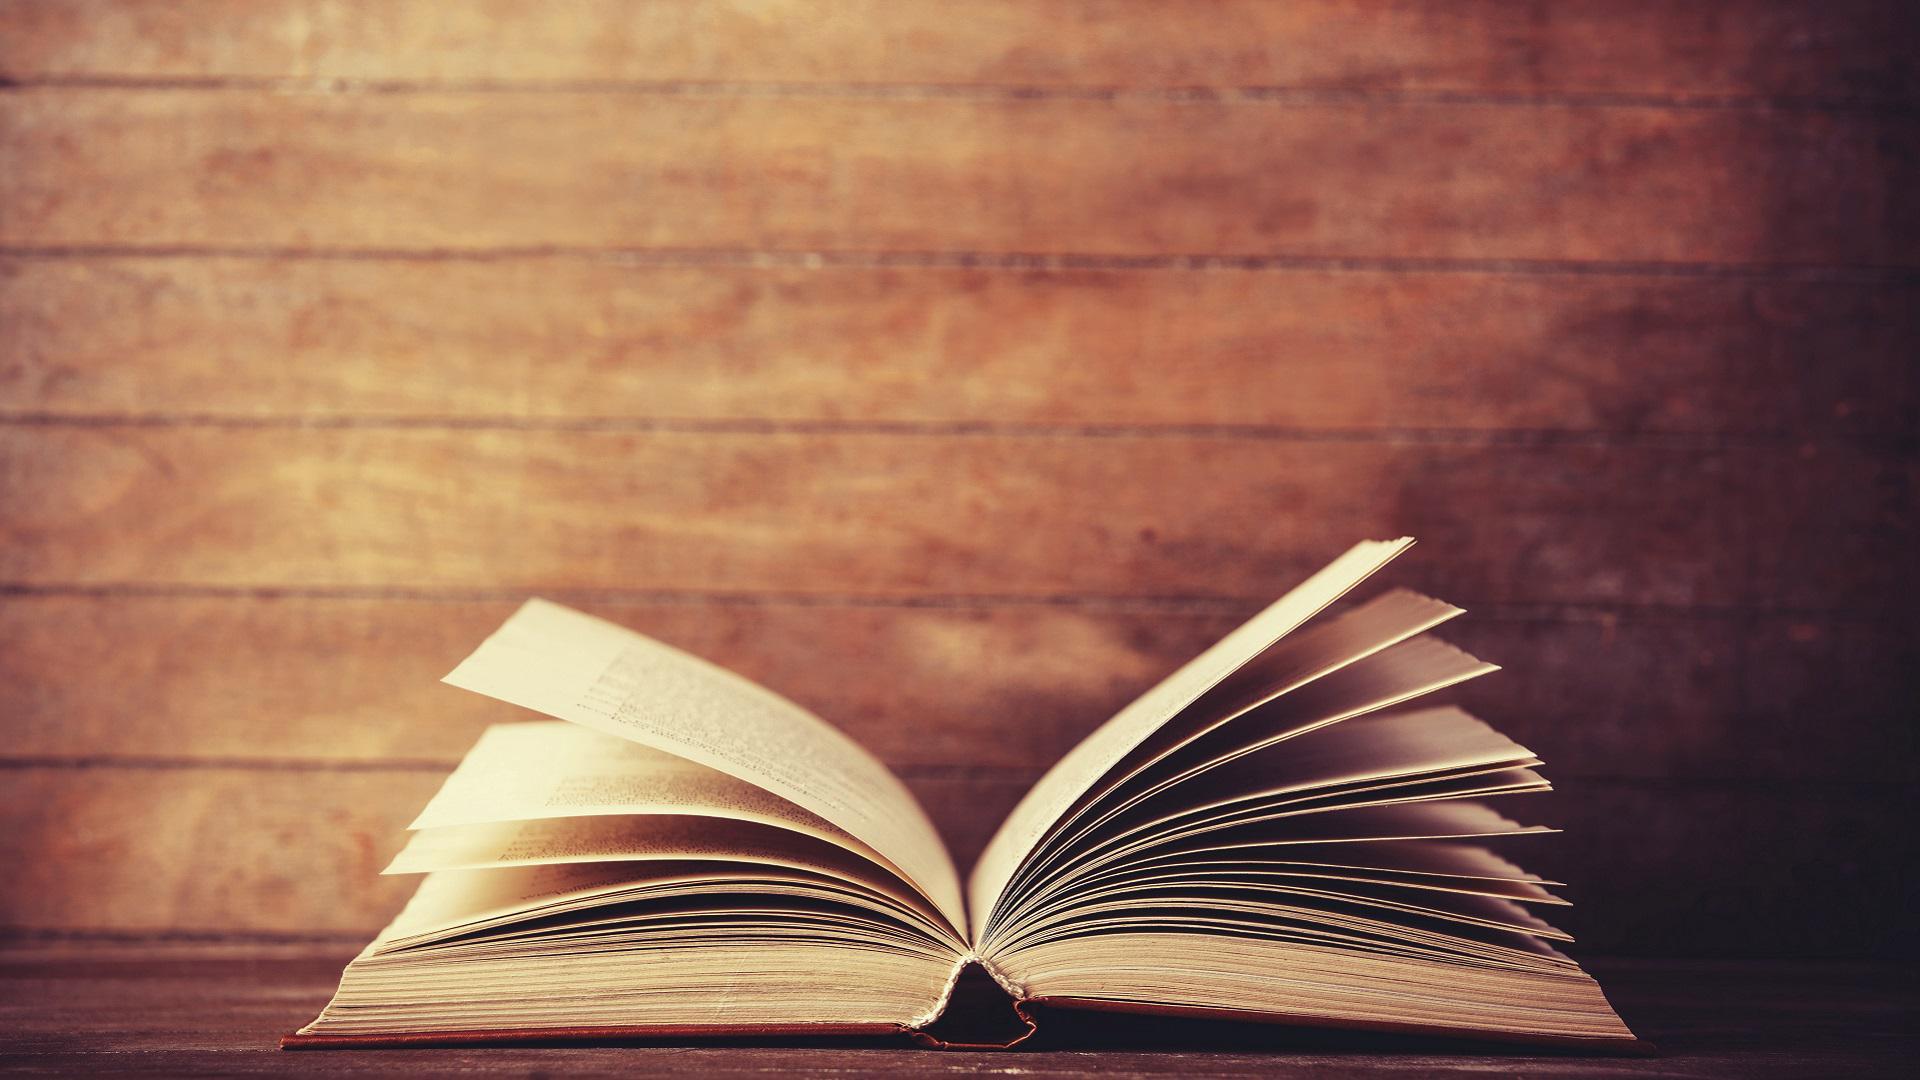 Bedah Buku Mawaqif, Sumbangan Ilmu Kalam di Zaman Modern